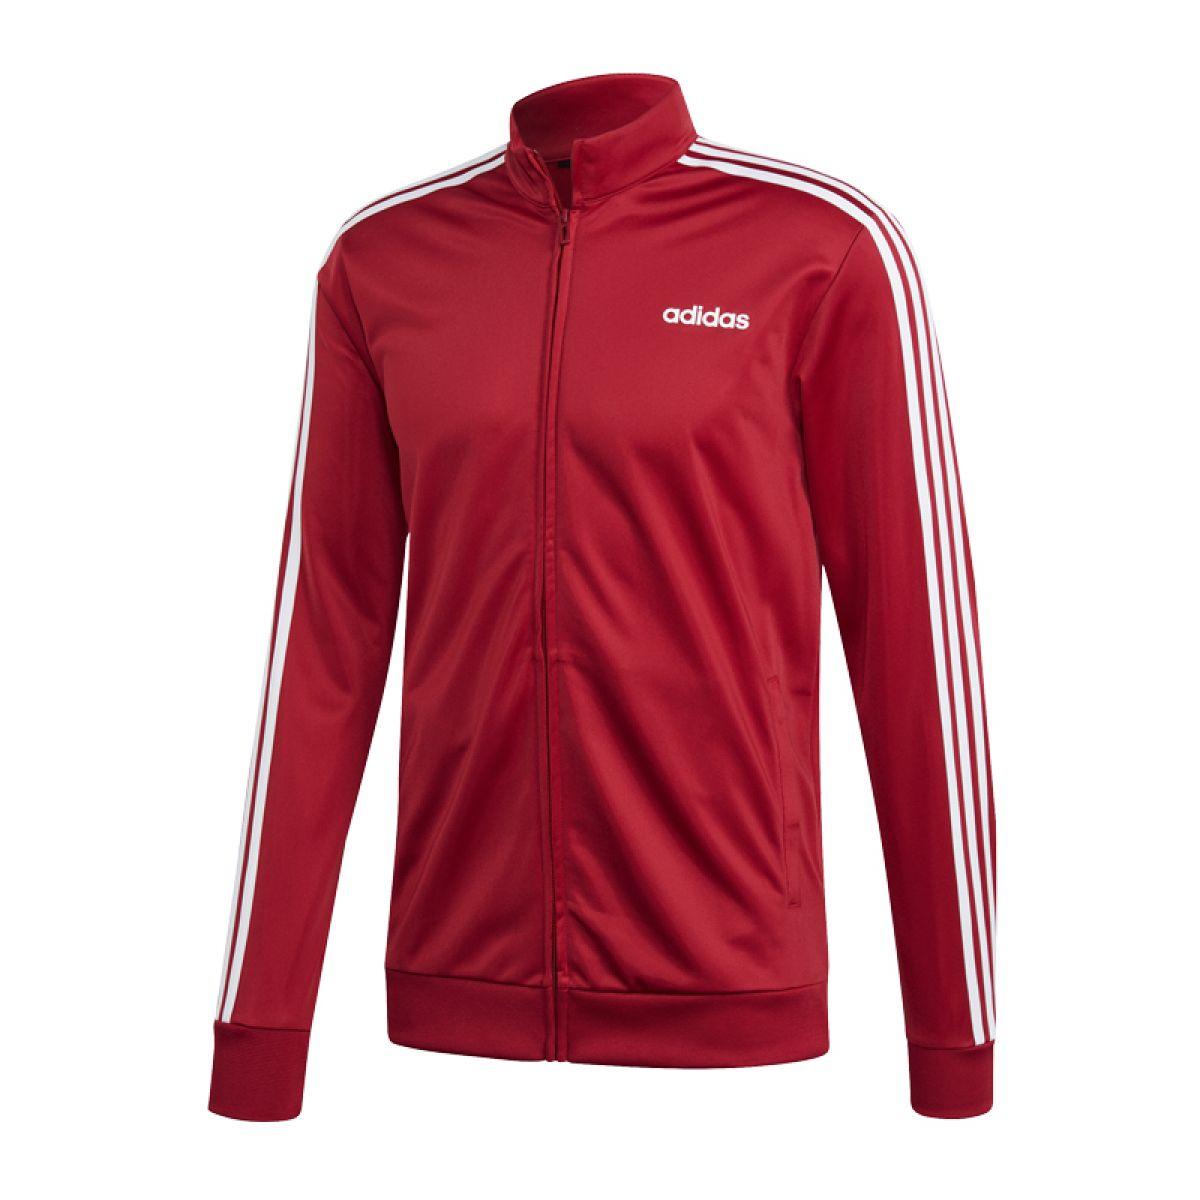 Adidas Essentials 3 Stripes TT Top